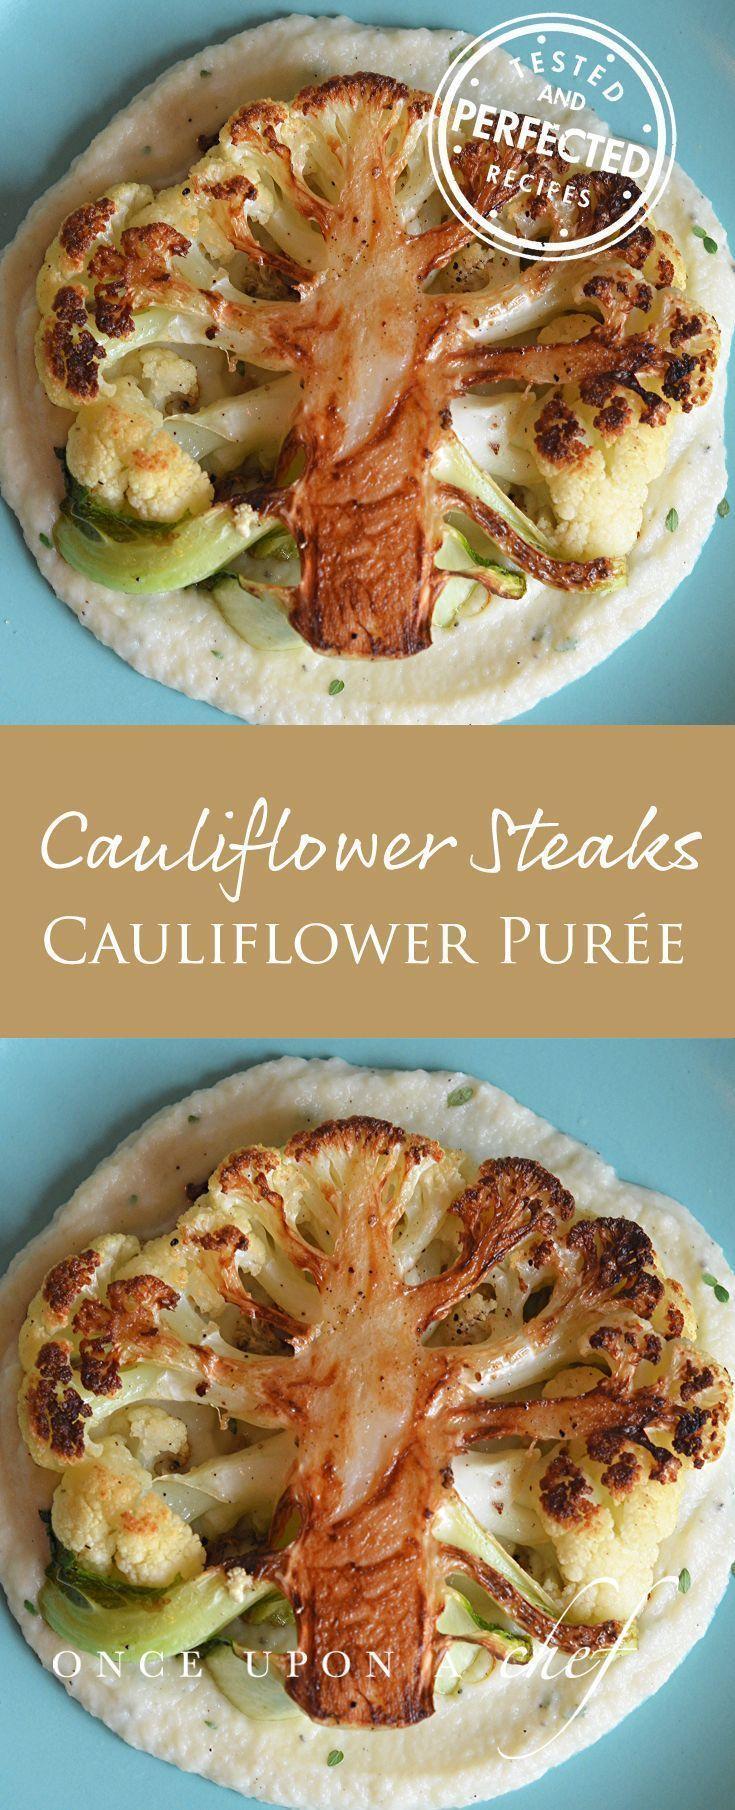 Cauliflower Steaks with Cauliflower Puree